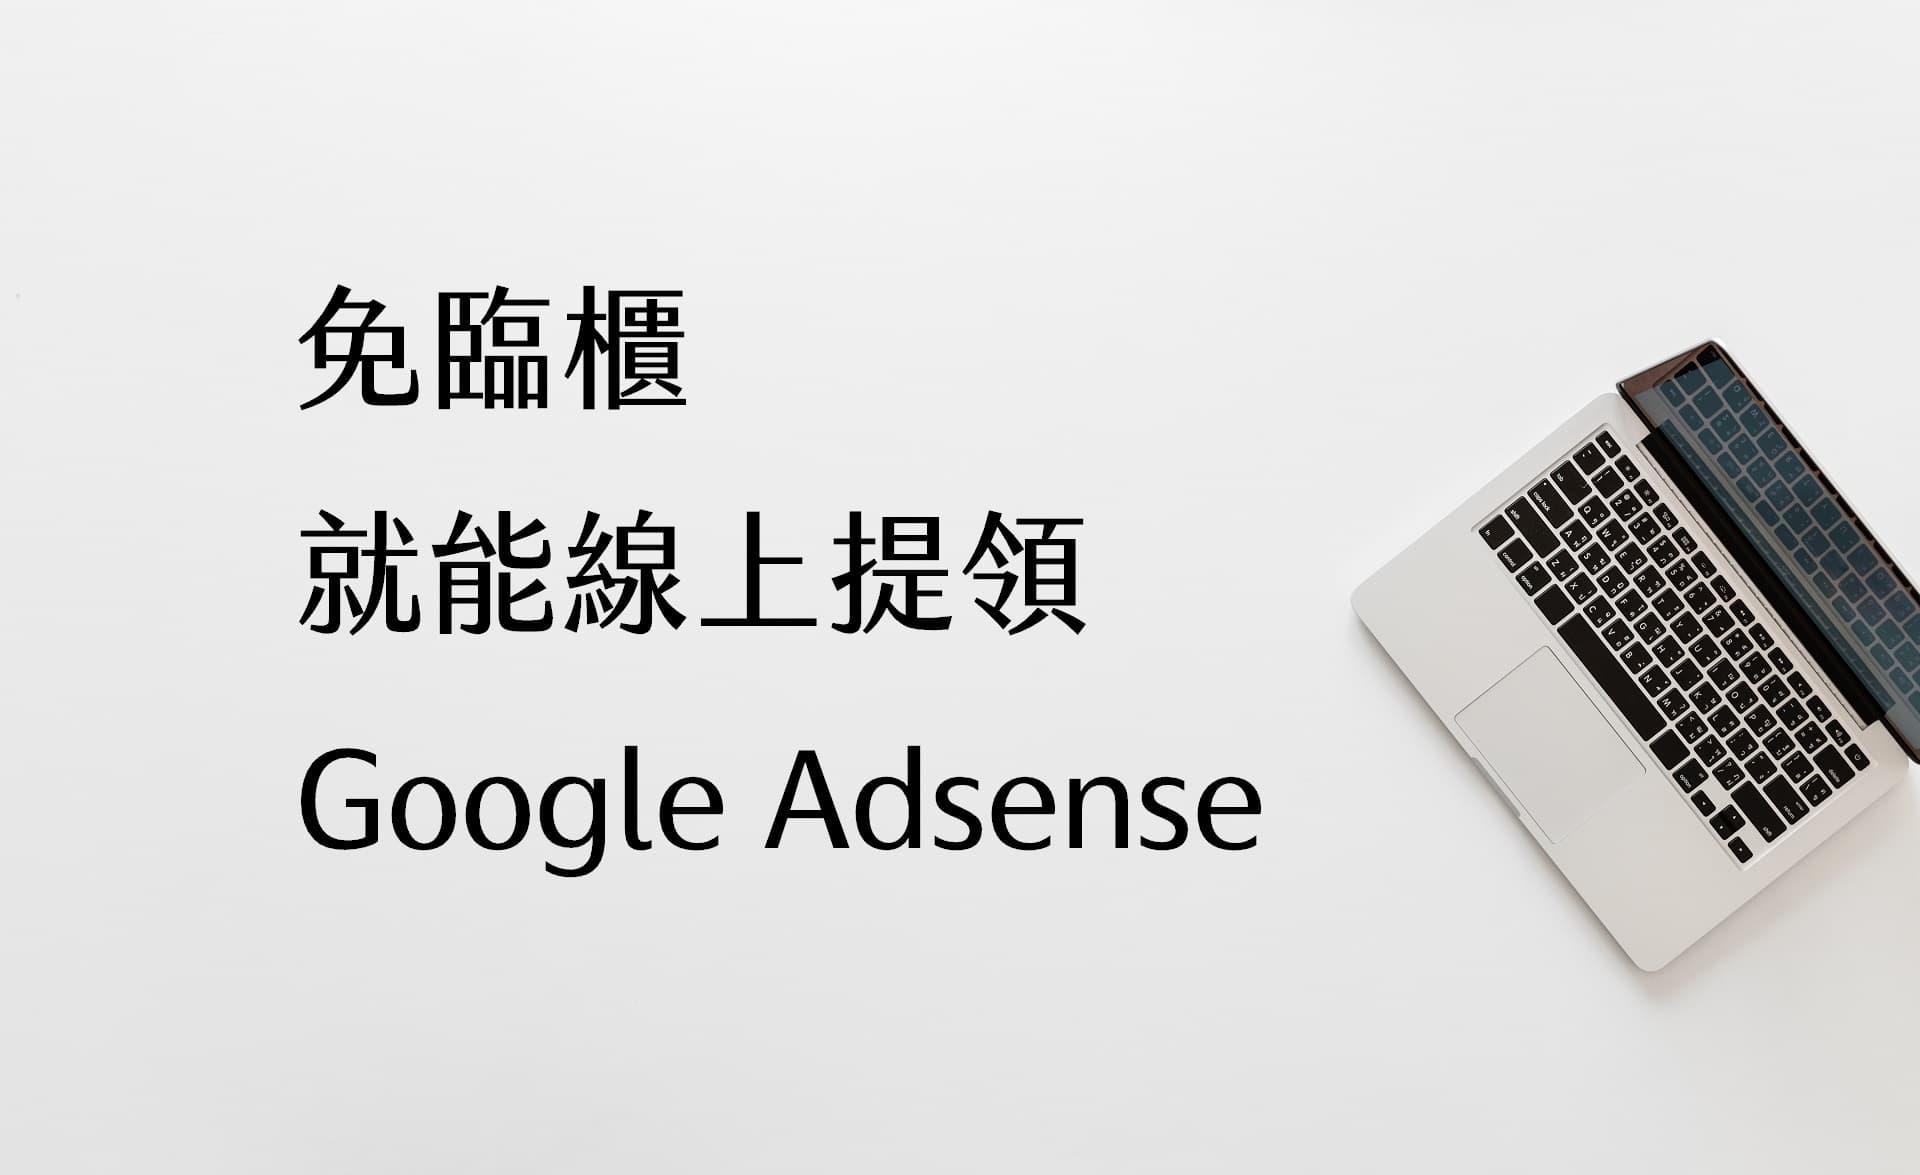 提領GoogleAdsense